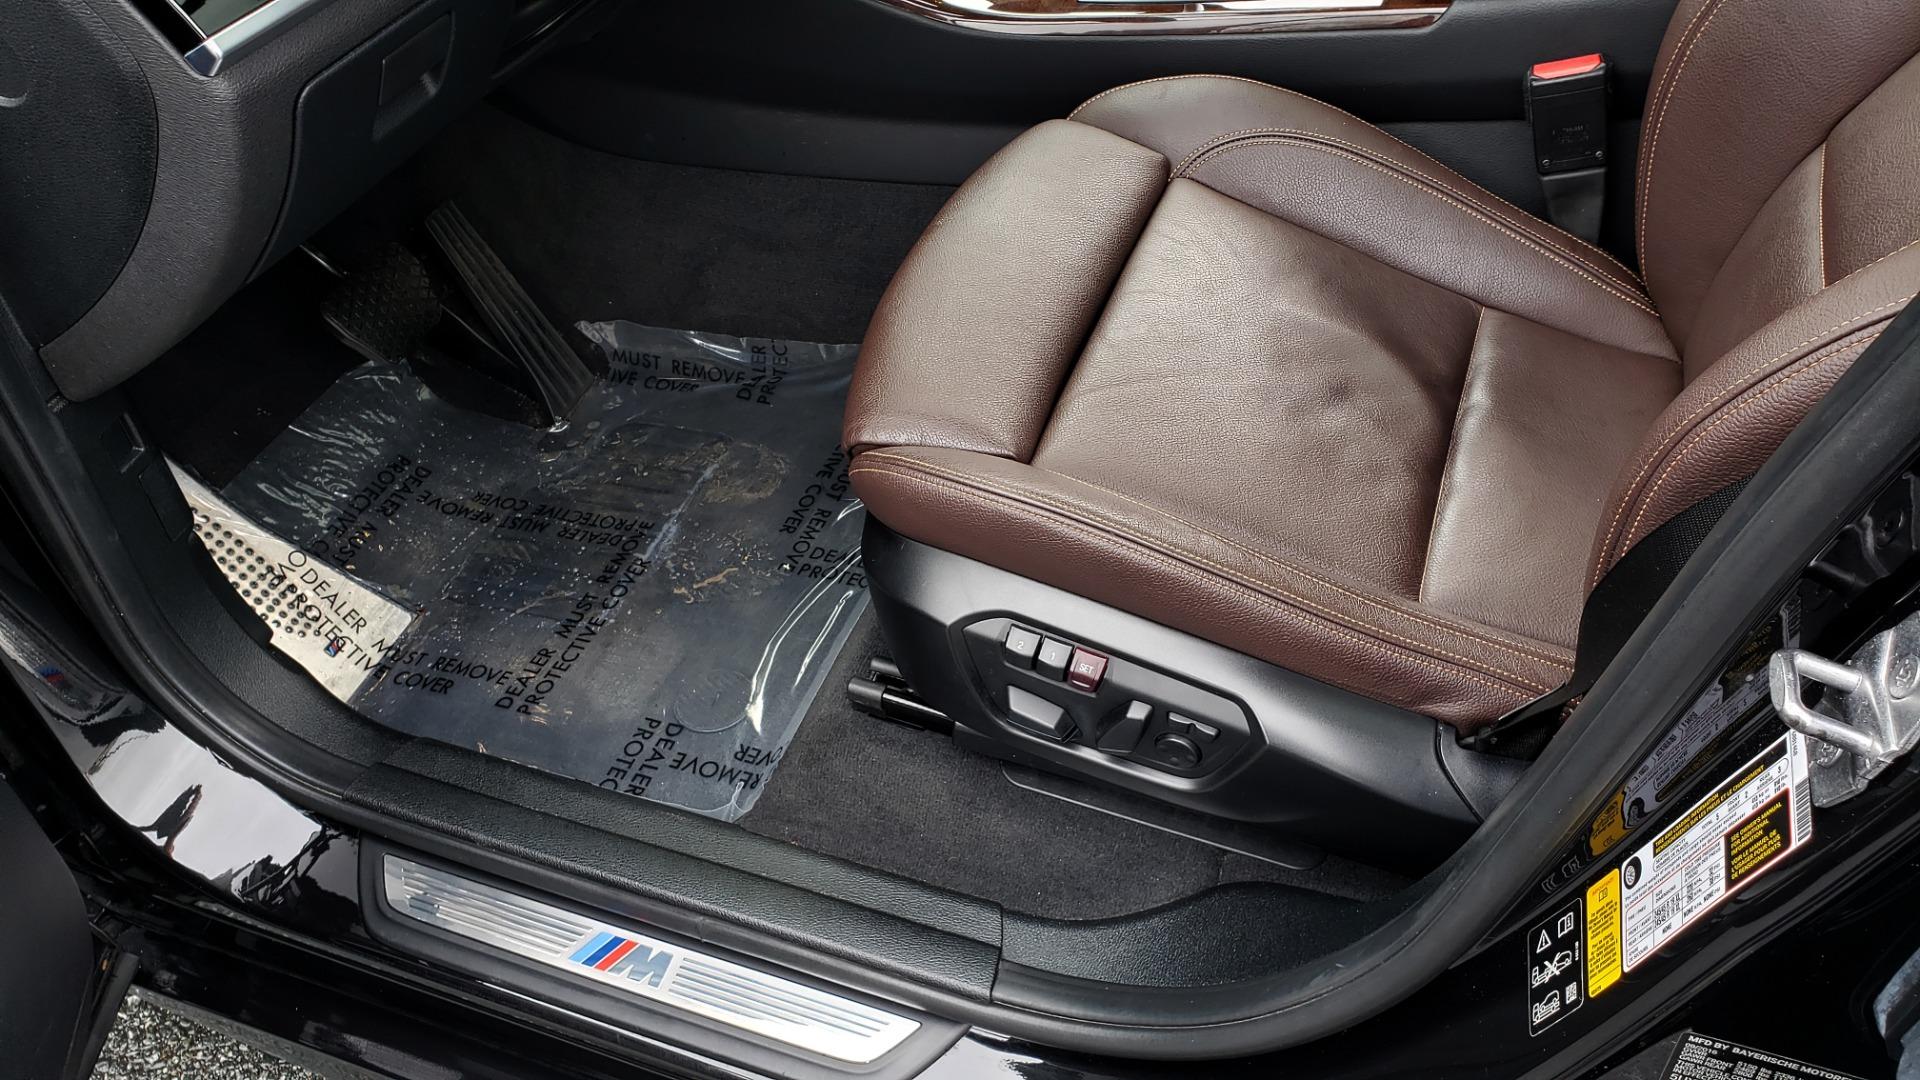 Used 2017 BMW X3 XDRIVE35I M-SPORT / DRVR ASST PLUS / TECHNOLOGY / HUD / BLIND SPOT for sale Sold at Formula Imports in Charlotte NC 28227 33